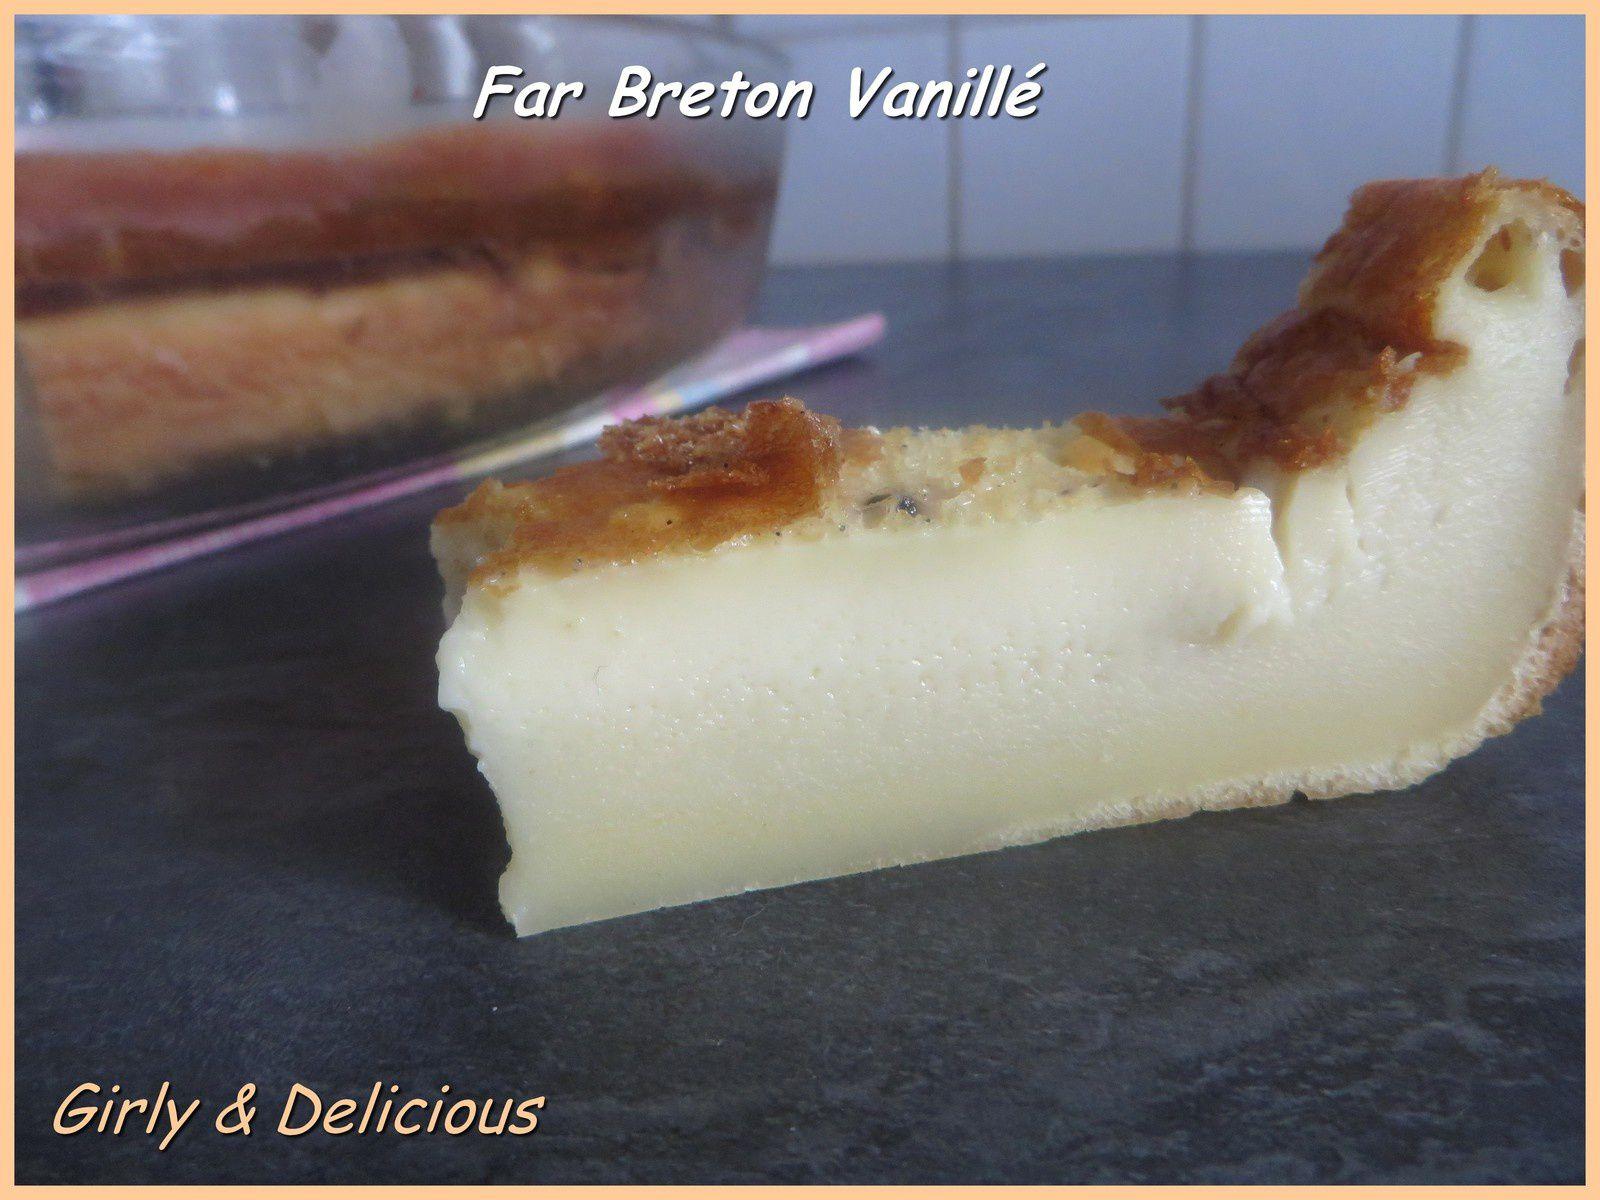 Far Breton vanillé